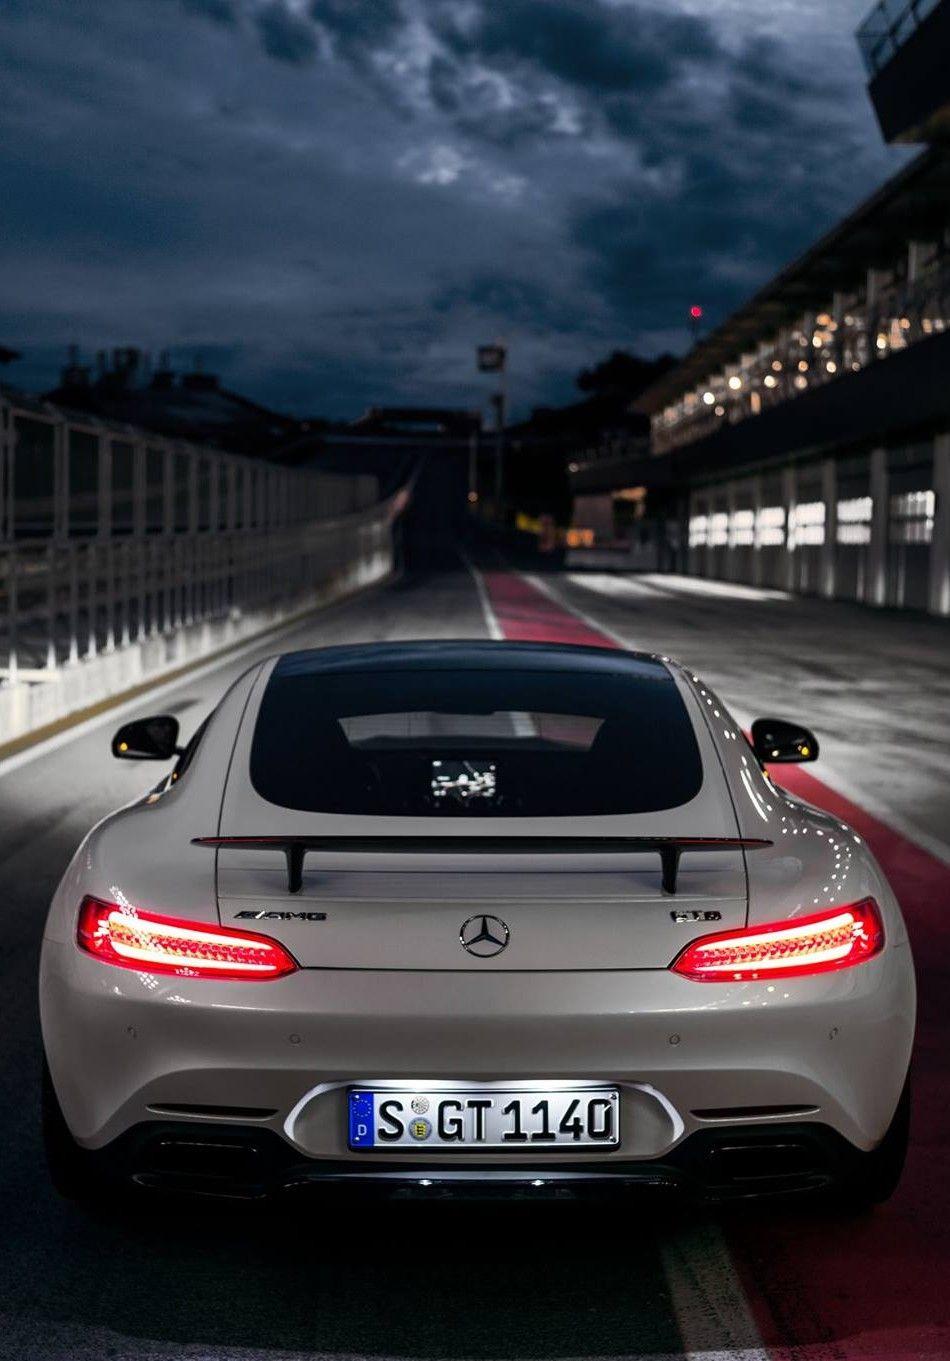 Mercedes Amg Gts Mercedes Car Mercedes Amg Gt S Mercedes Amg